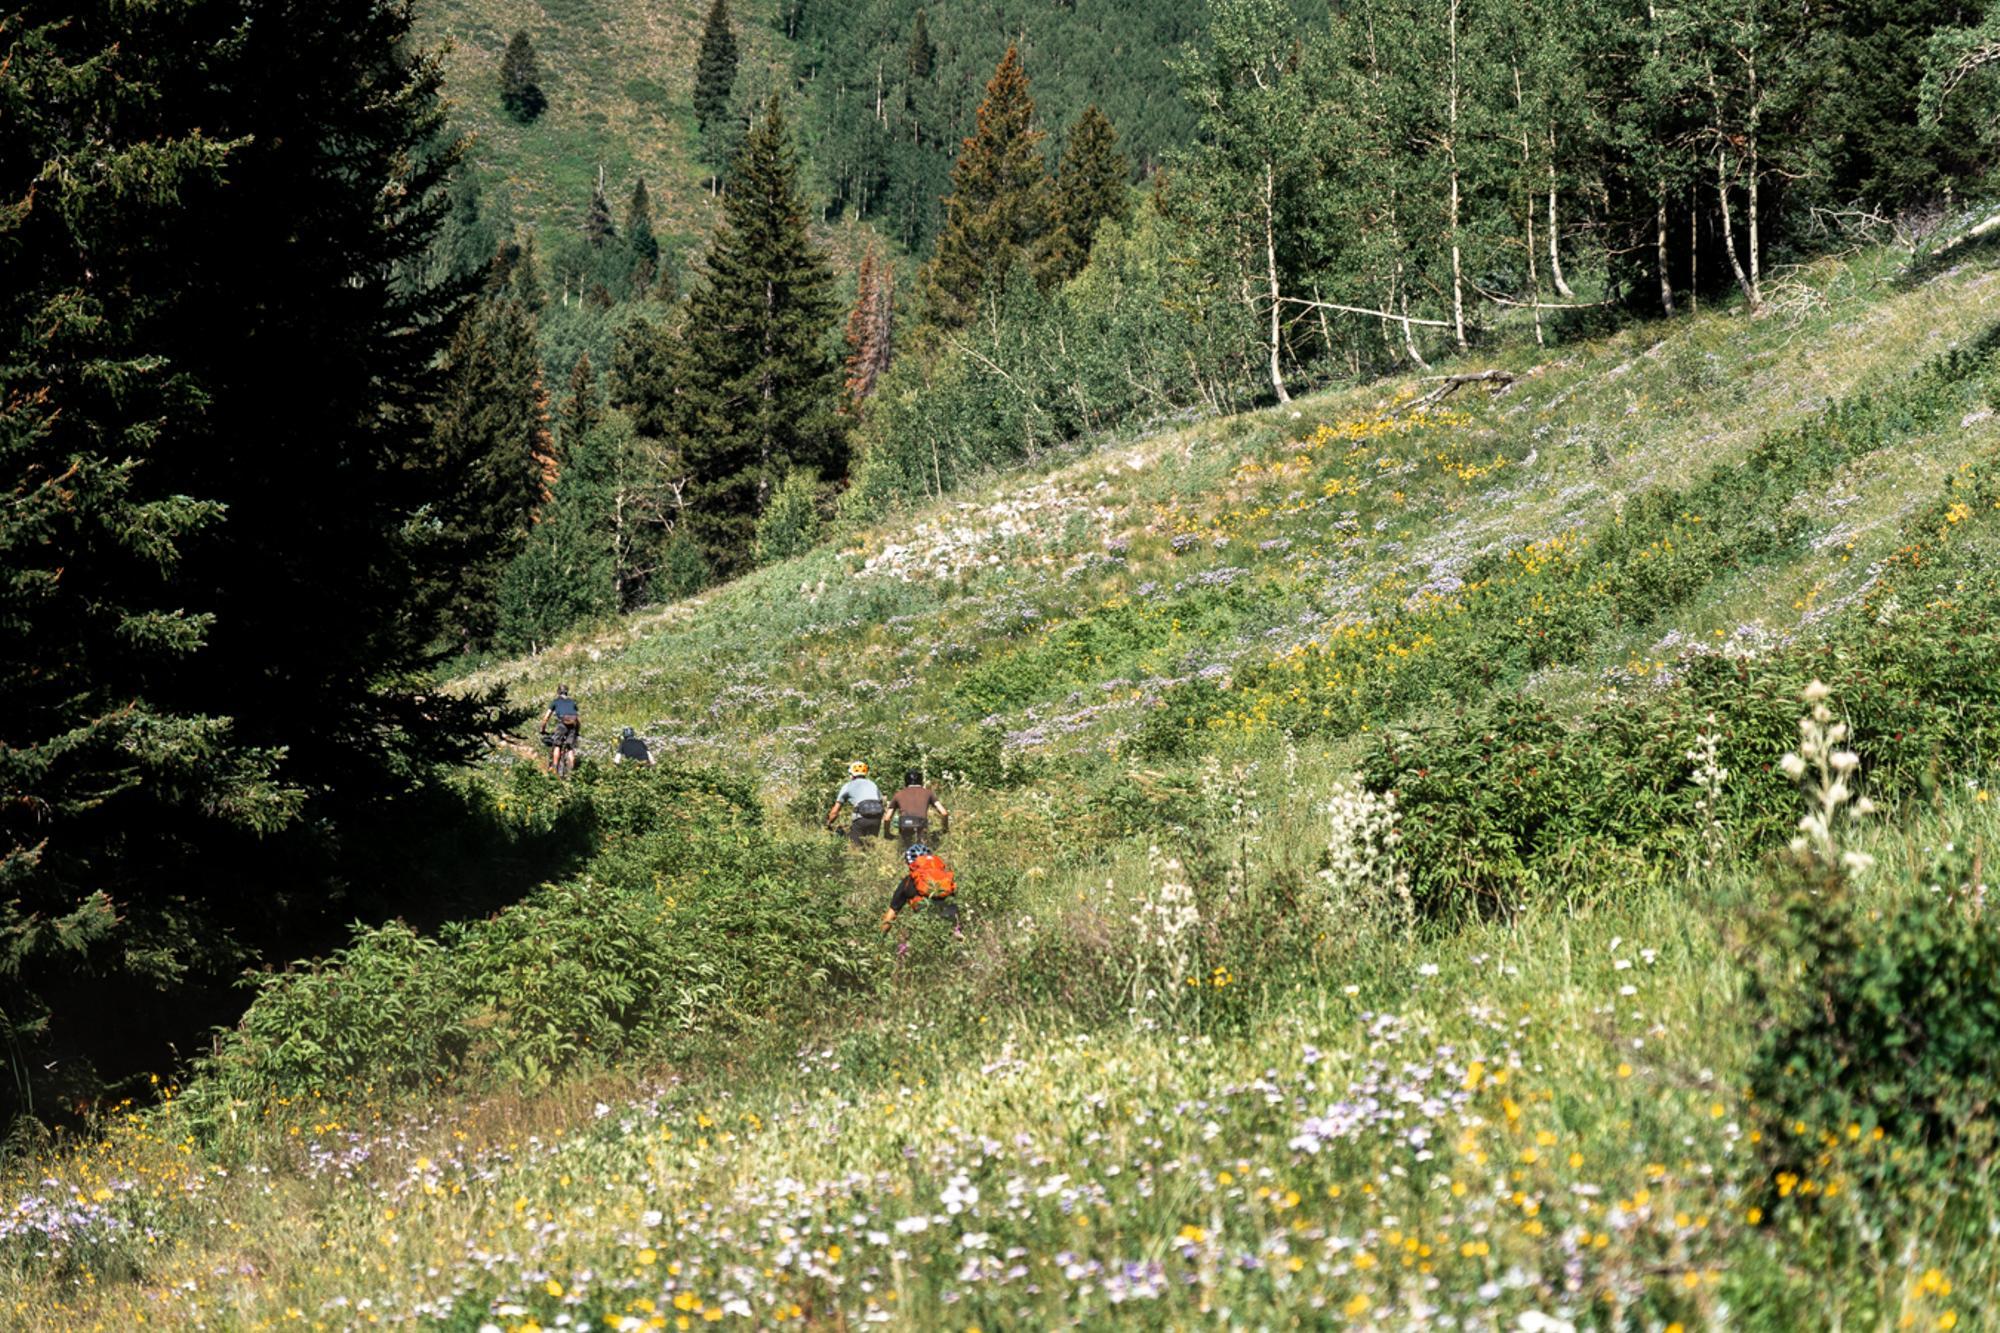 Continental Drifters: Durango to Moab by Bike Along the San Juan Huts